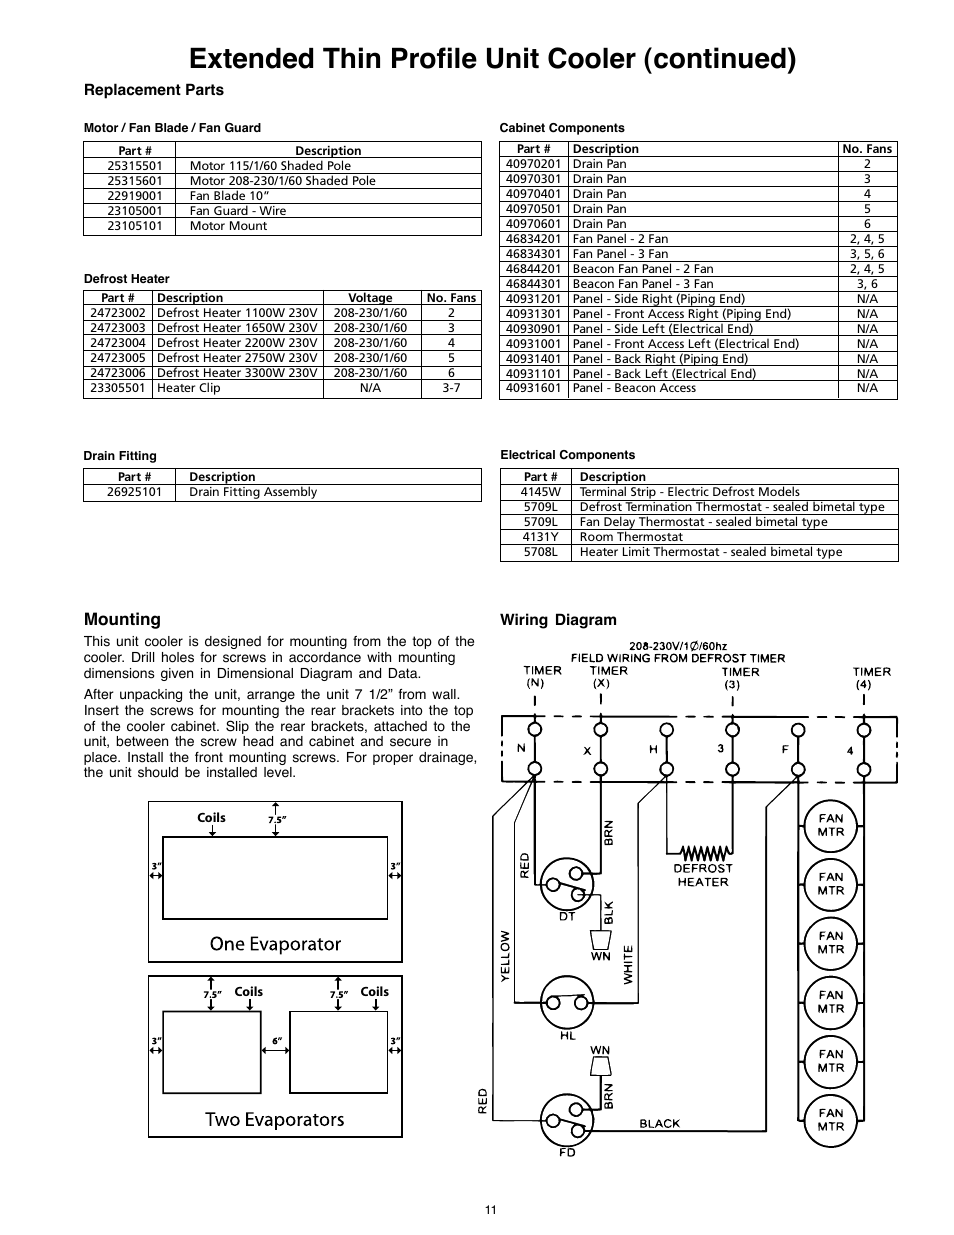 larkin evaporator wiring diagram 32 wiring diagram images wiring diagrams crackthecode co Boat Trailer Wiring Diagram Electric Fan Wiring Diagram